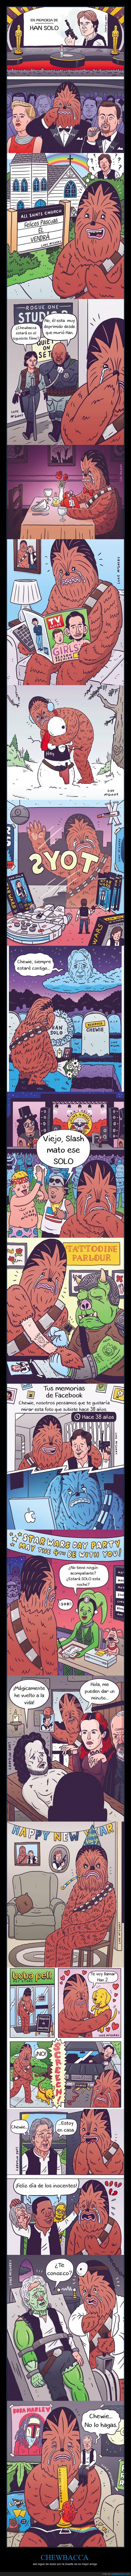 Boba Fett,broma,caricatura,Chewbacca,droga,Finn,Frankenstein,Han Solo,humor,Juego de Tronos,Kylo Ren,Luke McGarry,luto,muerte,Oscar,Rogue One,Star Wars,tatuaje